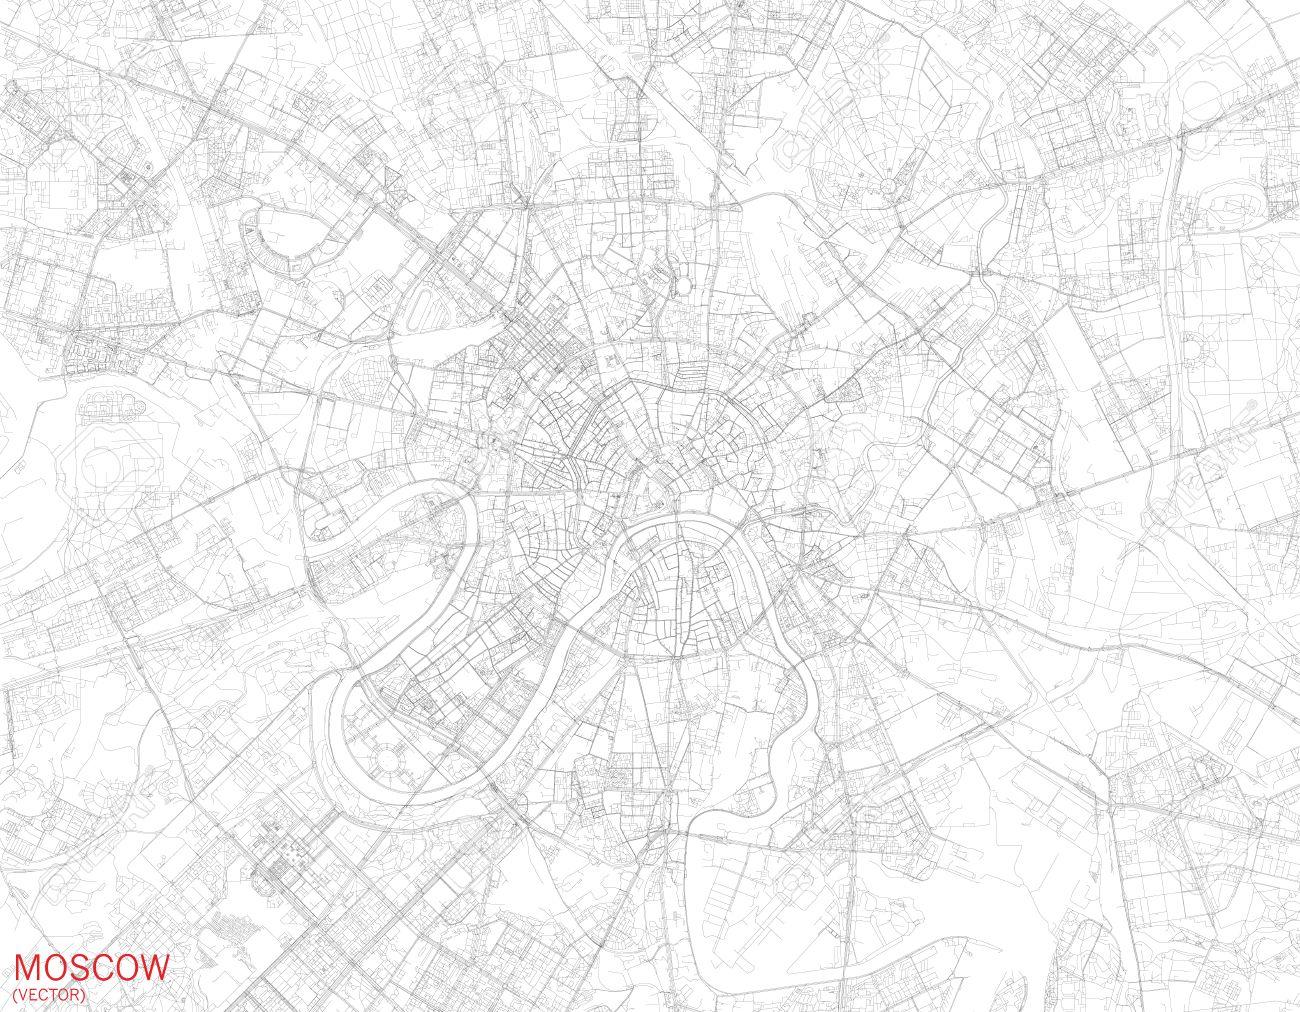 Mapa De Moscu Foto Satelite Calles Y Carreteras Rusia